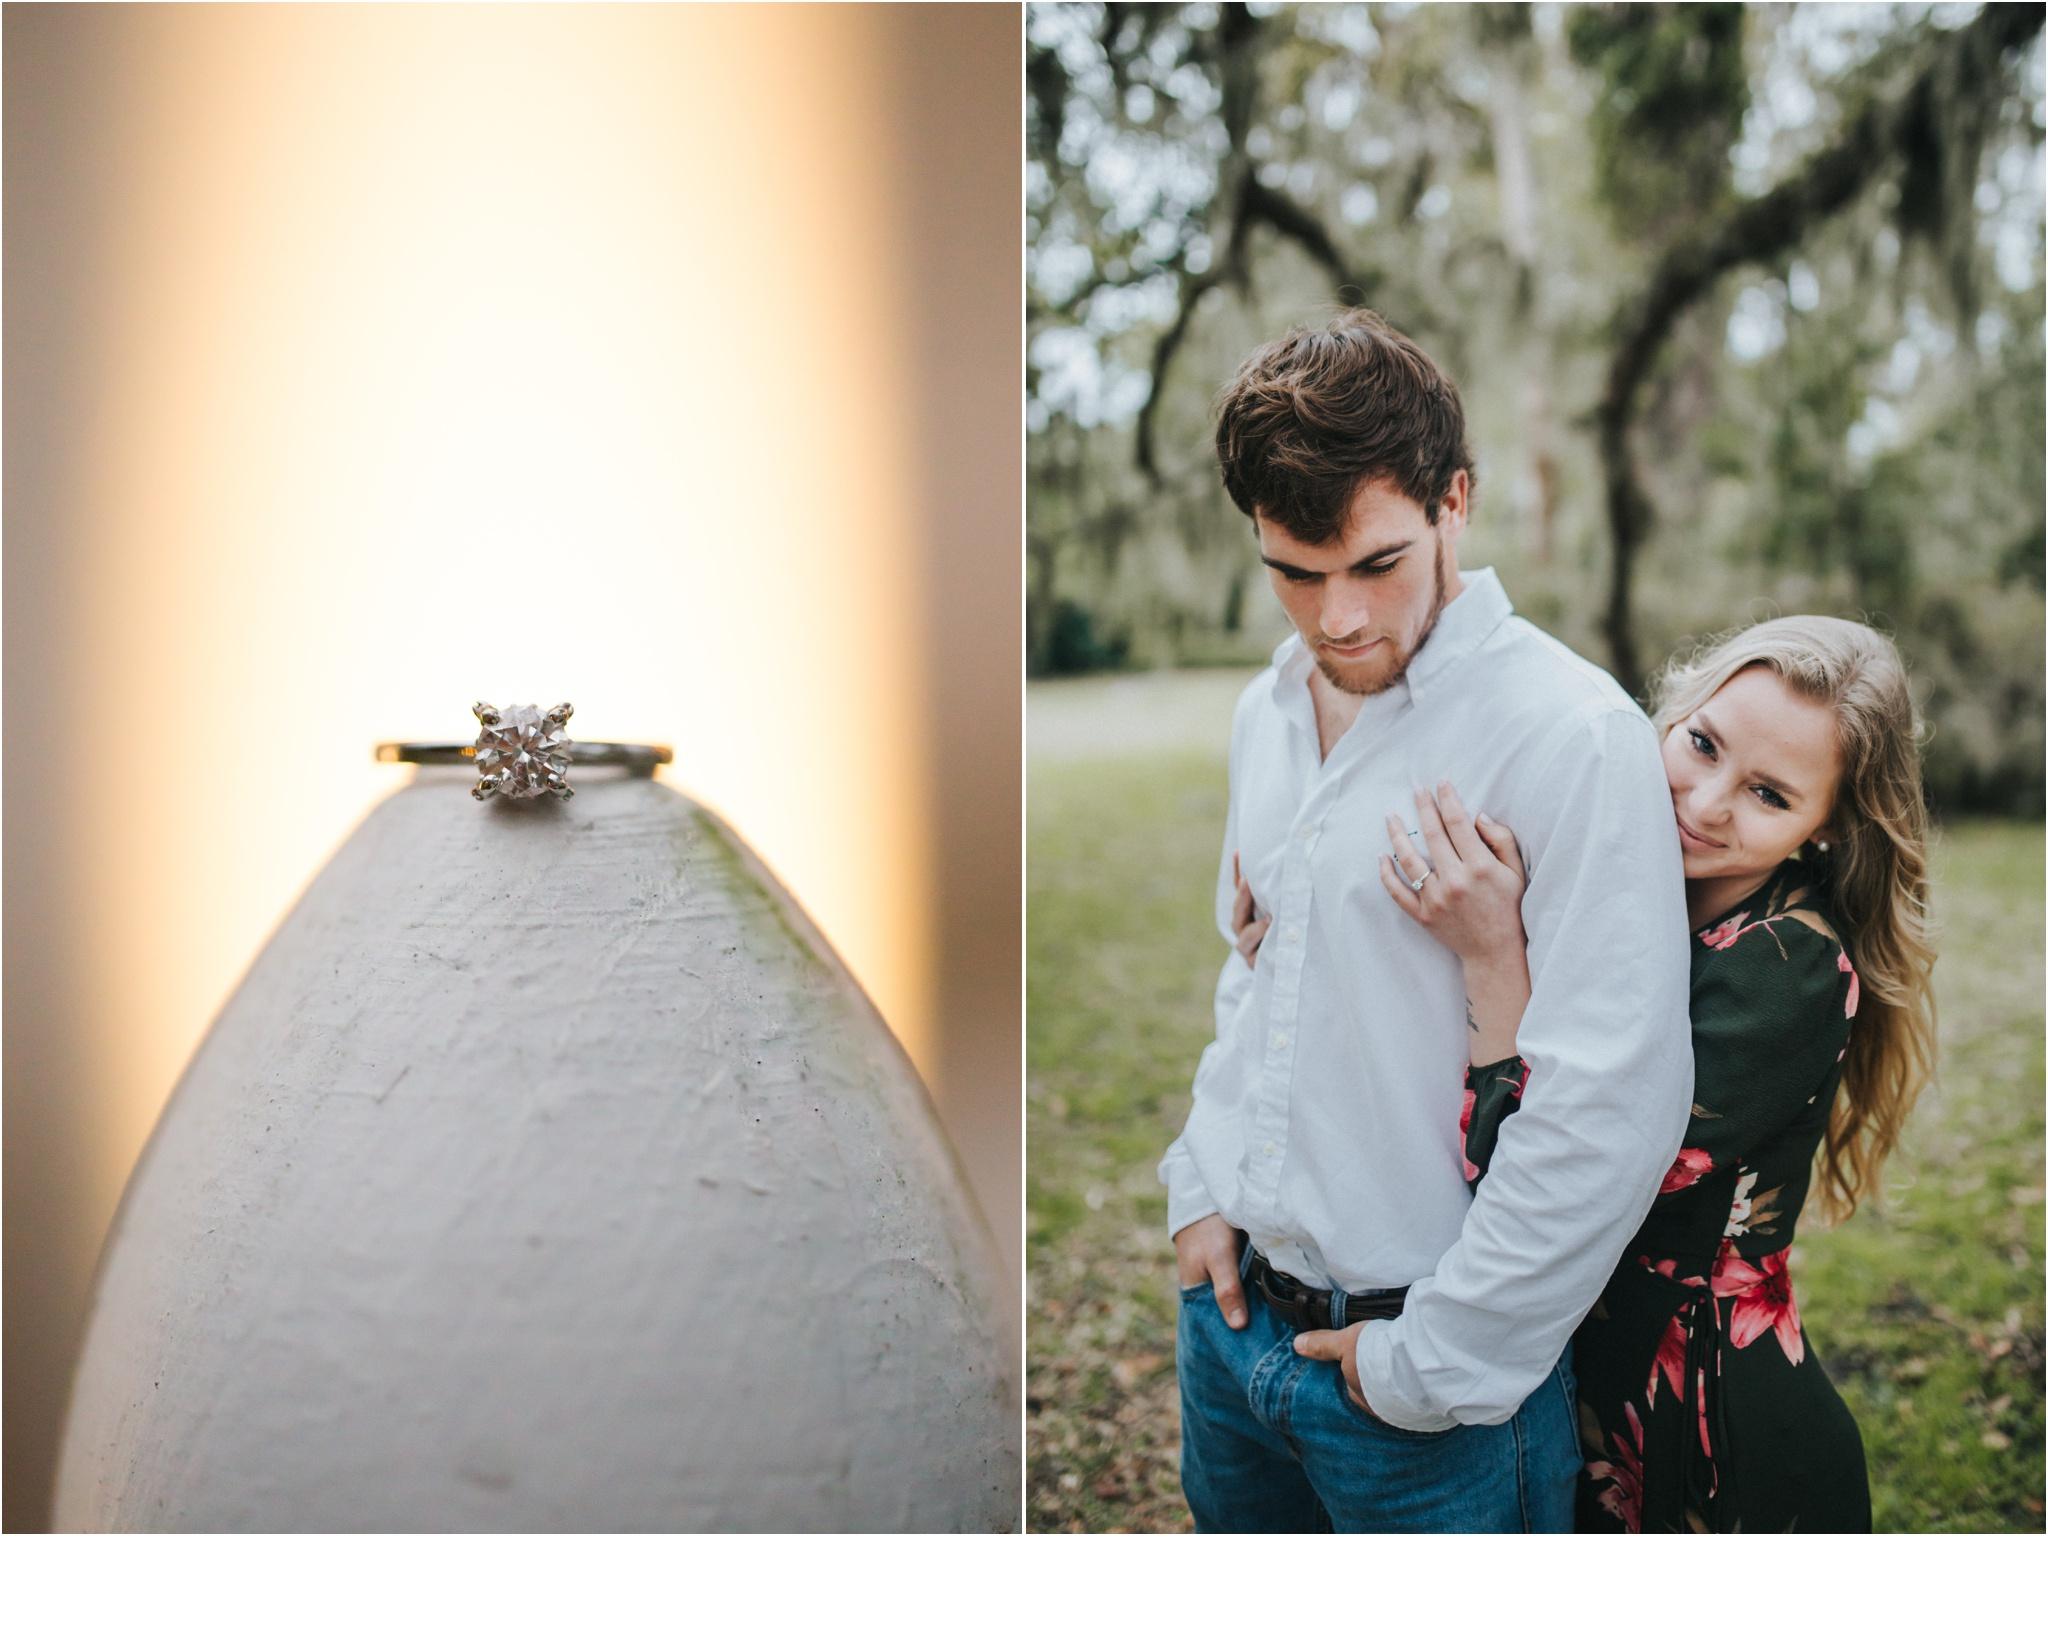 Rainey_Gregg_Photography_St._Simons_Island_Georgia_California_Wedding_Portrait_Photography_0713.jpg